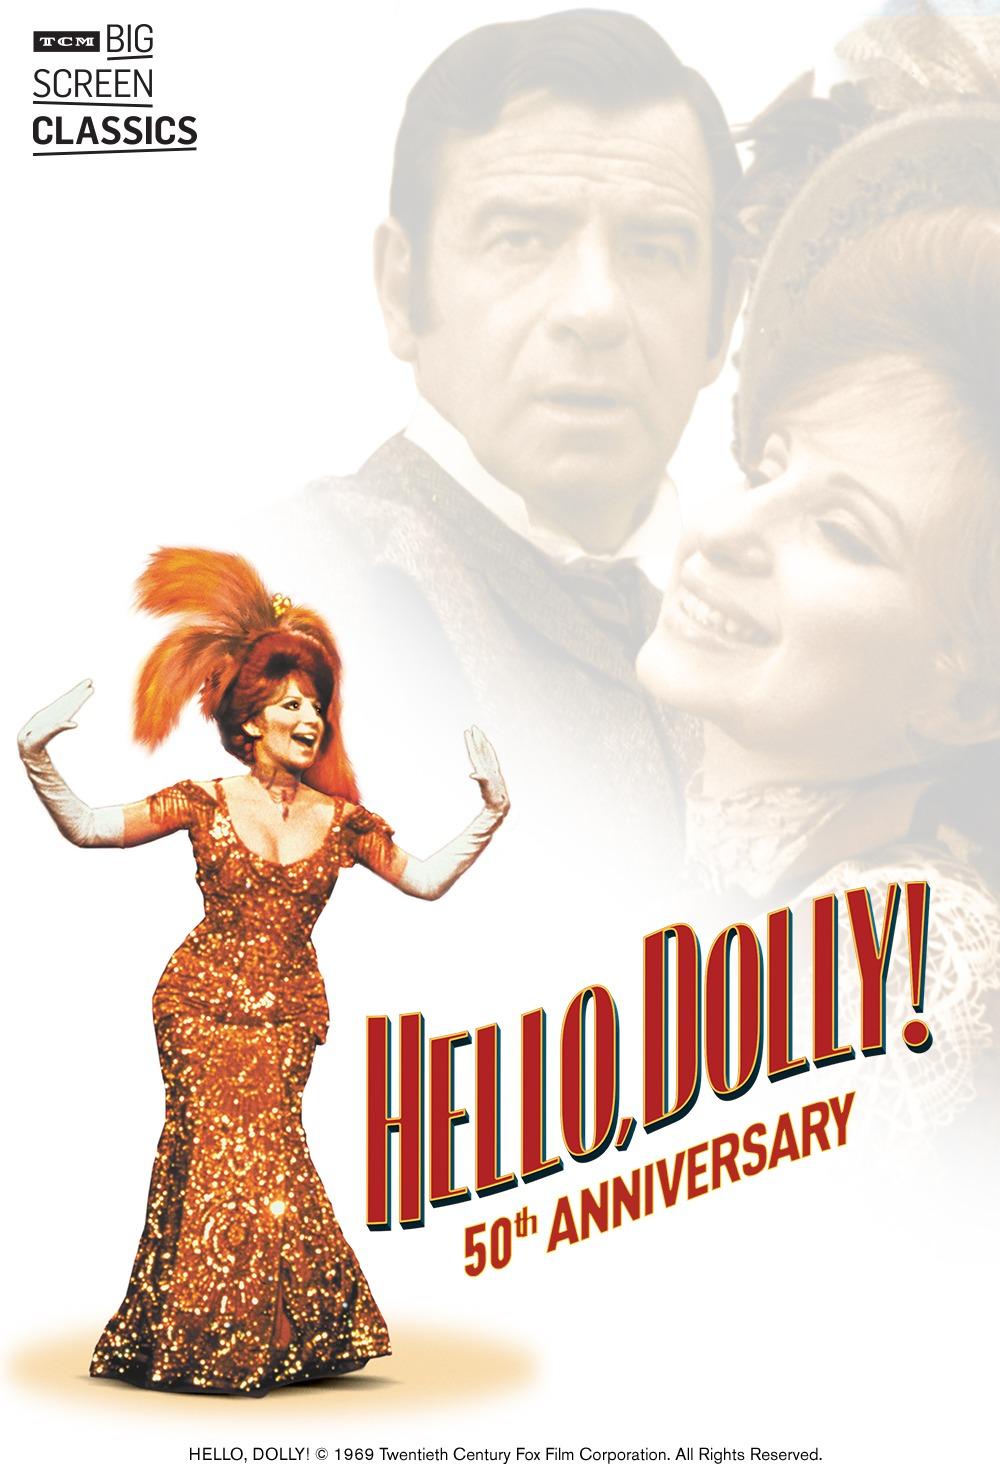 hello-dolly-poster-a0a5191463747825483f7217171b6946.jpg